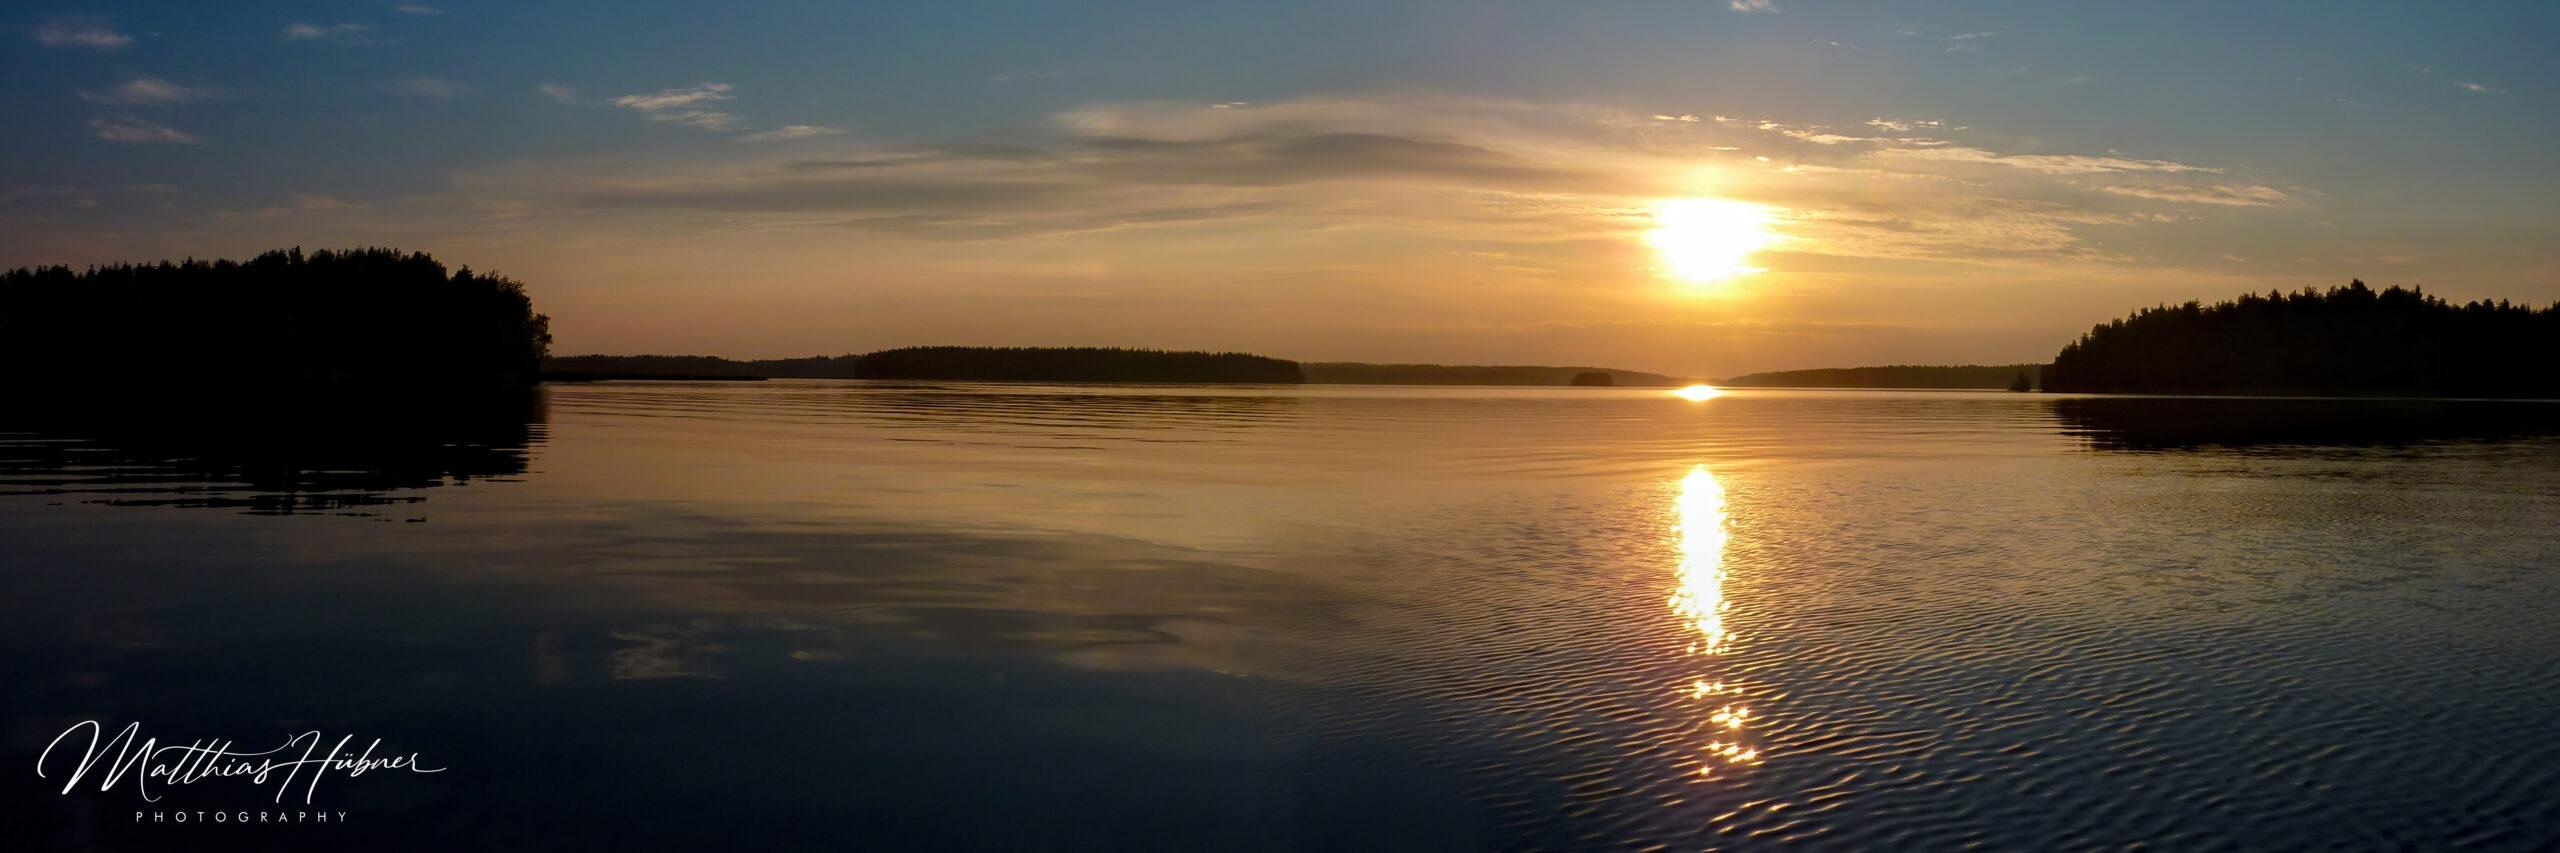 Sunset Unnukka finland huebner photography